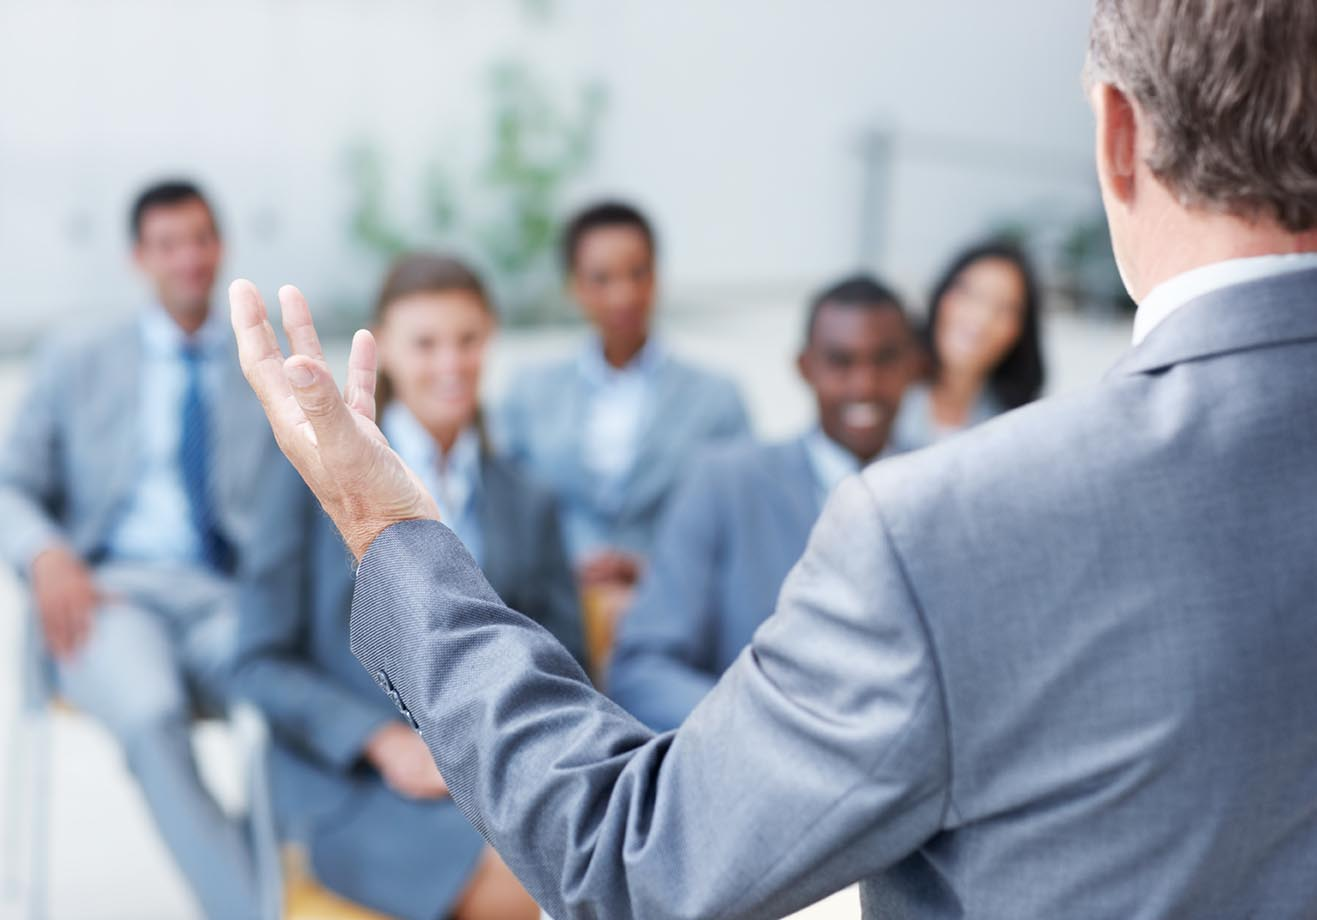 improve employee performance Houston, behavioral coaching, human resource development and management, Houston workplace performance, counseling and coaching